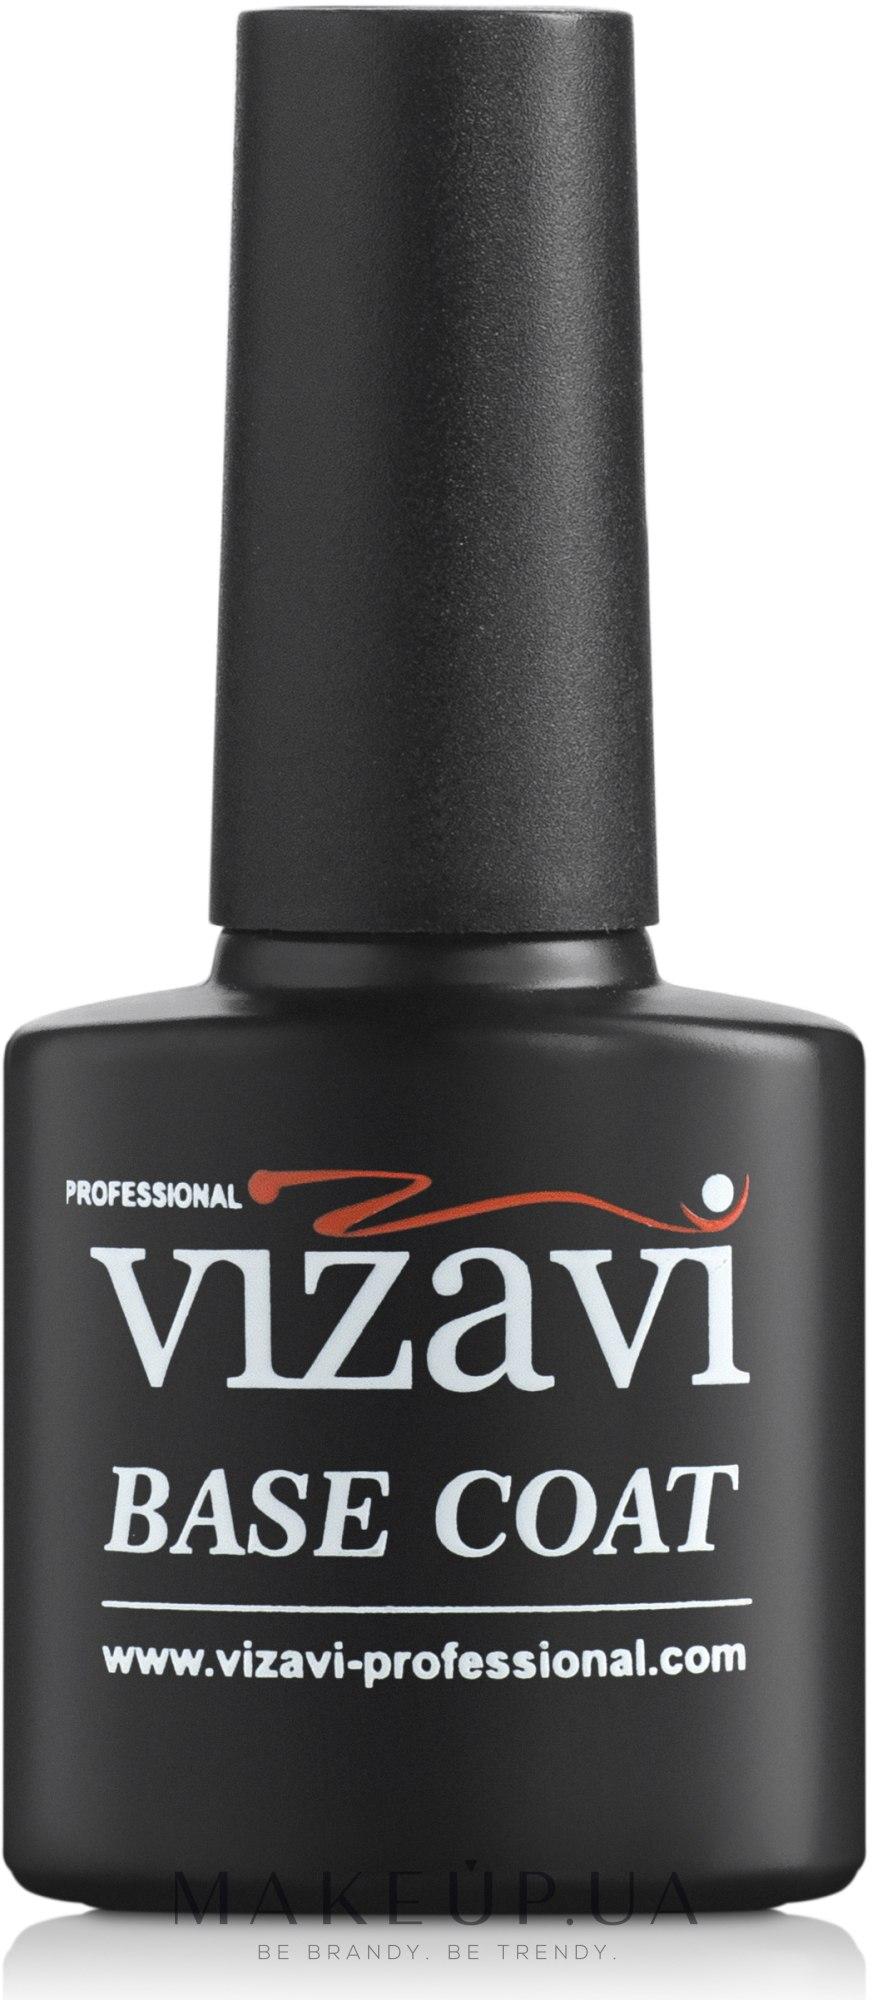 База для гель лака - Vizavi Professional Base Coat — фото 7.3ml